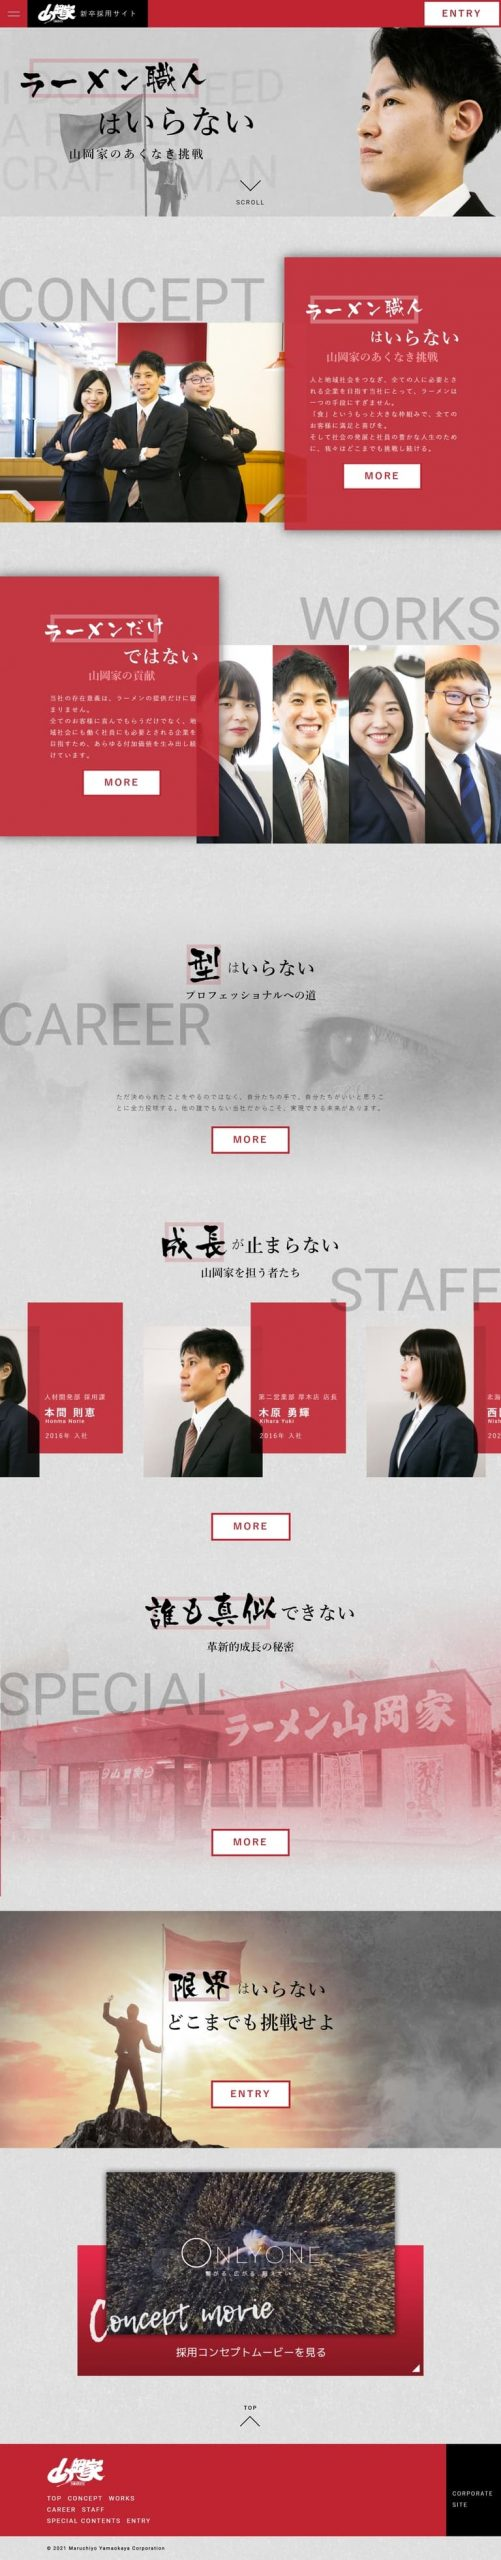 【JASDAQ上場】㈱丸千代山岡家(ラーメン山岡家)様 新卒採用サイト